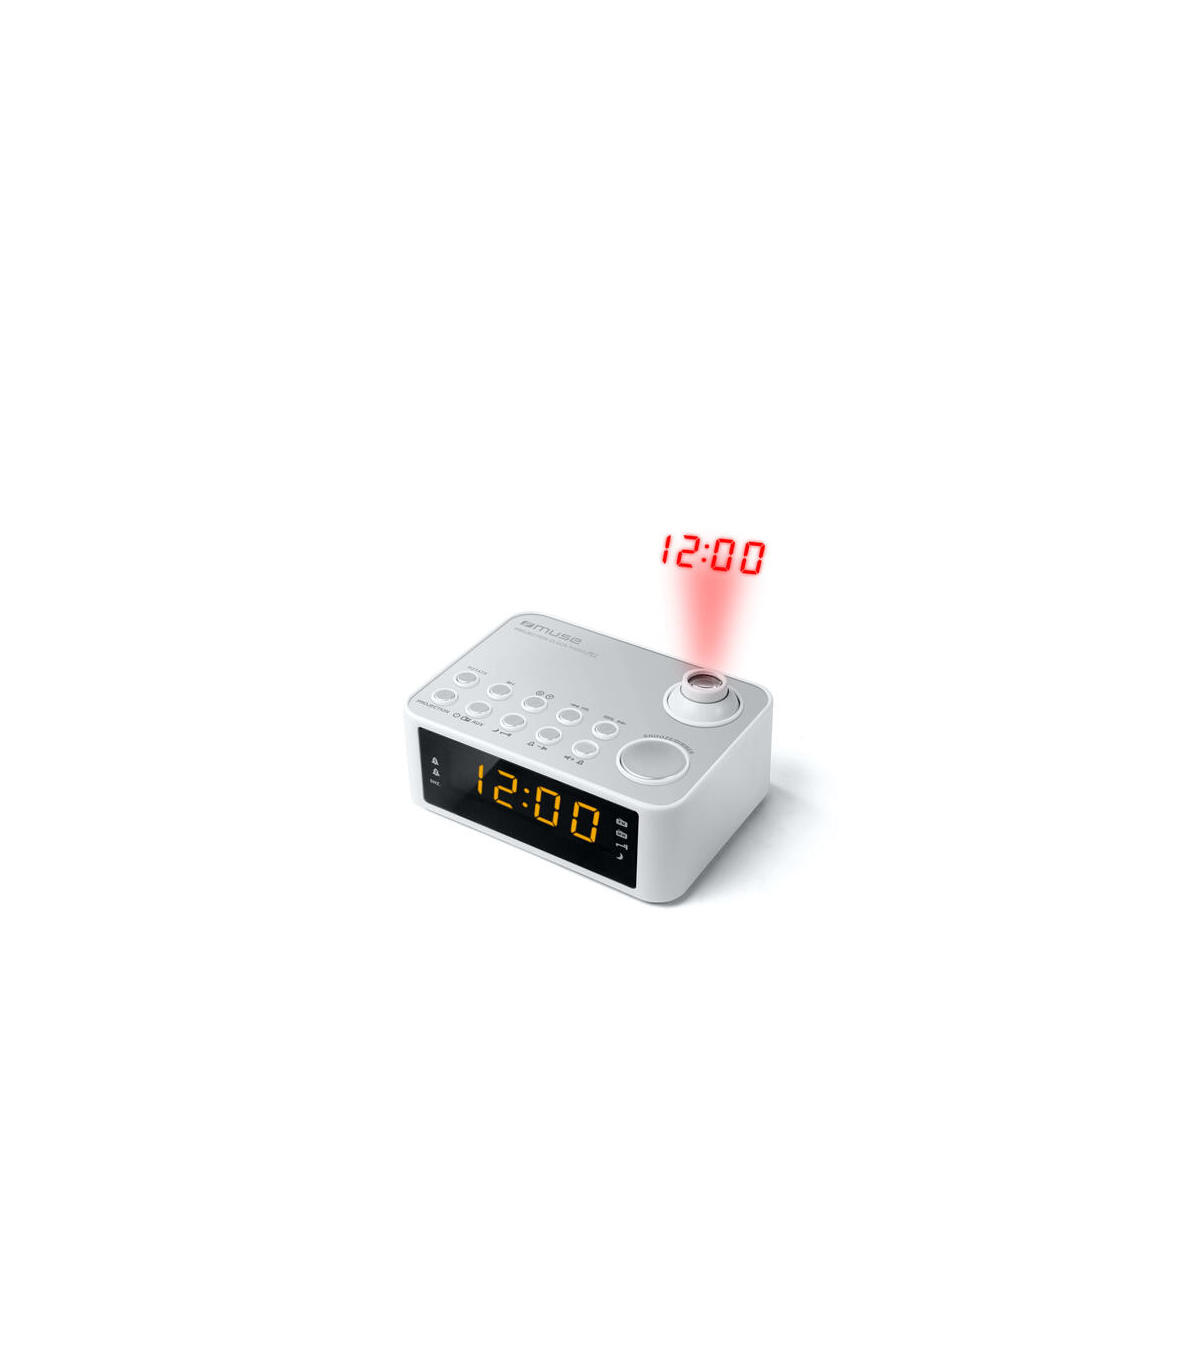 Muse M-28 VF Radio port/átil Pantalla LCD, Entrada AC de 230 V, frecuencia de 50 Hz